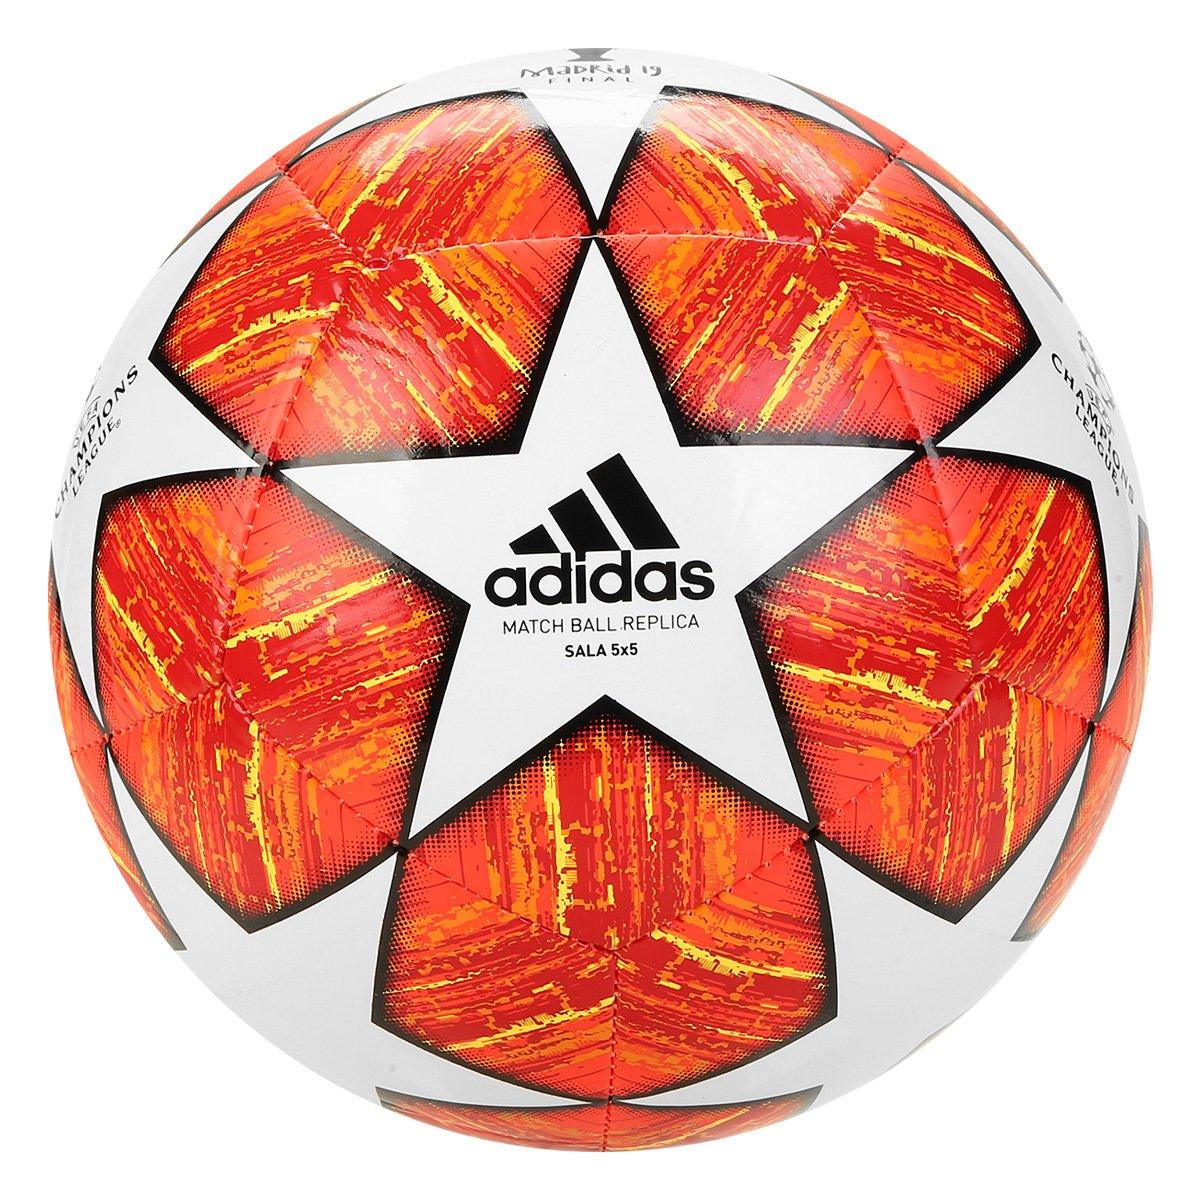 ff9bf7a306832 Bola de Futsal Adidas Uefa Champions League Finale 19 Match Ball 5X5 - Compre  Agora